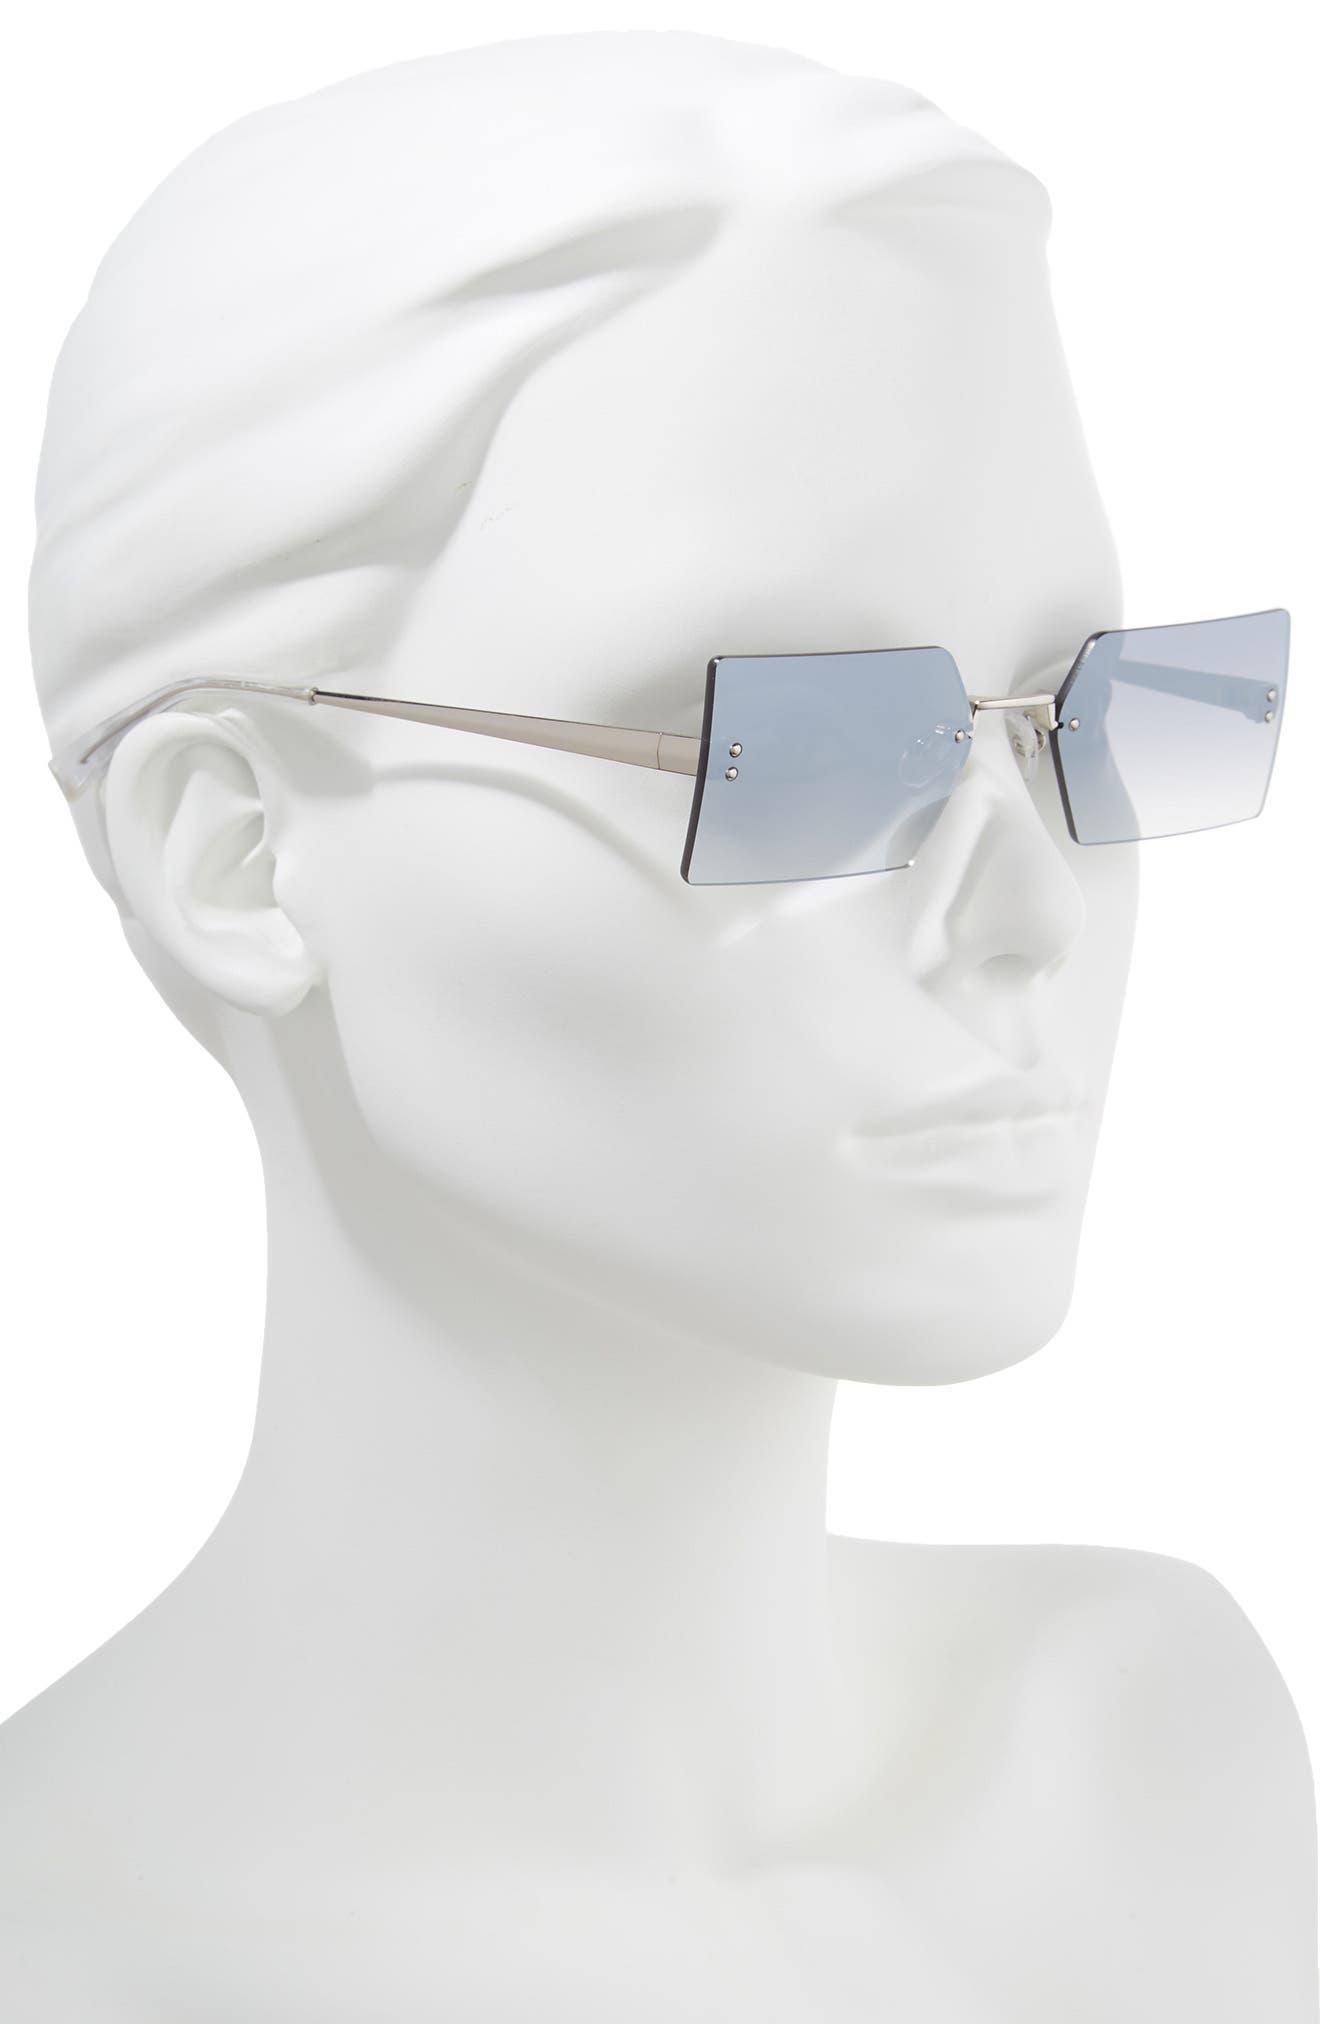 Grace 53mm Rimless Rectangular Sunglasses,                             Alternate thumbnail 2, color,                             Silver/ Smoke Gradient Flash